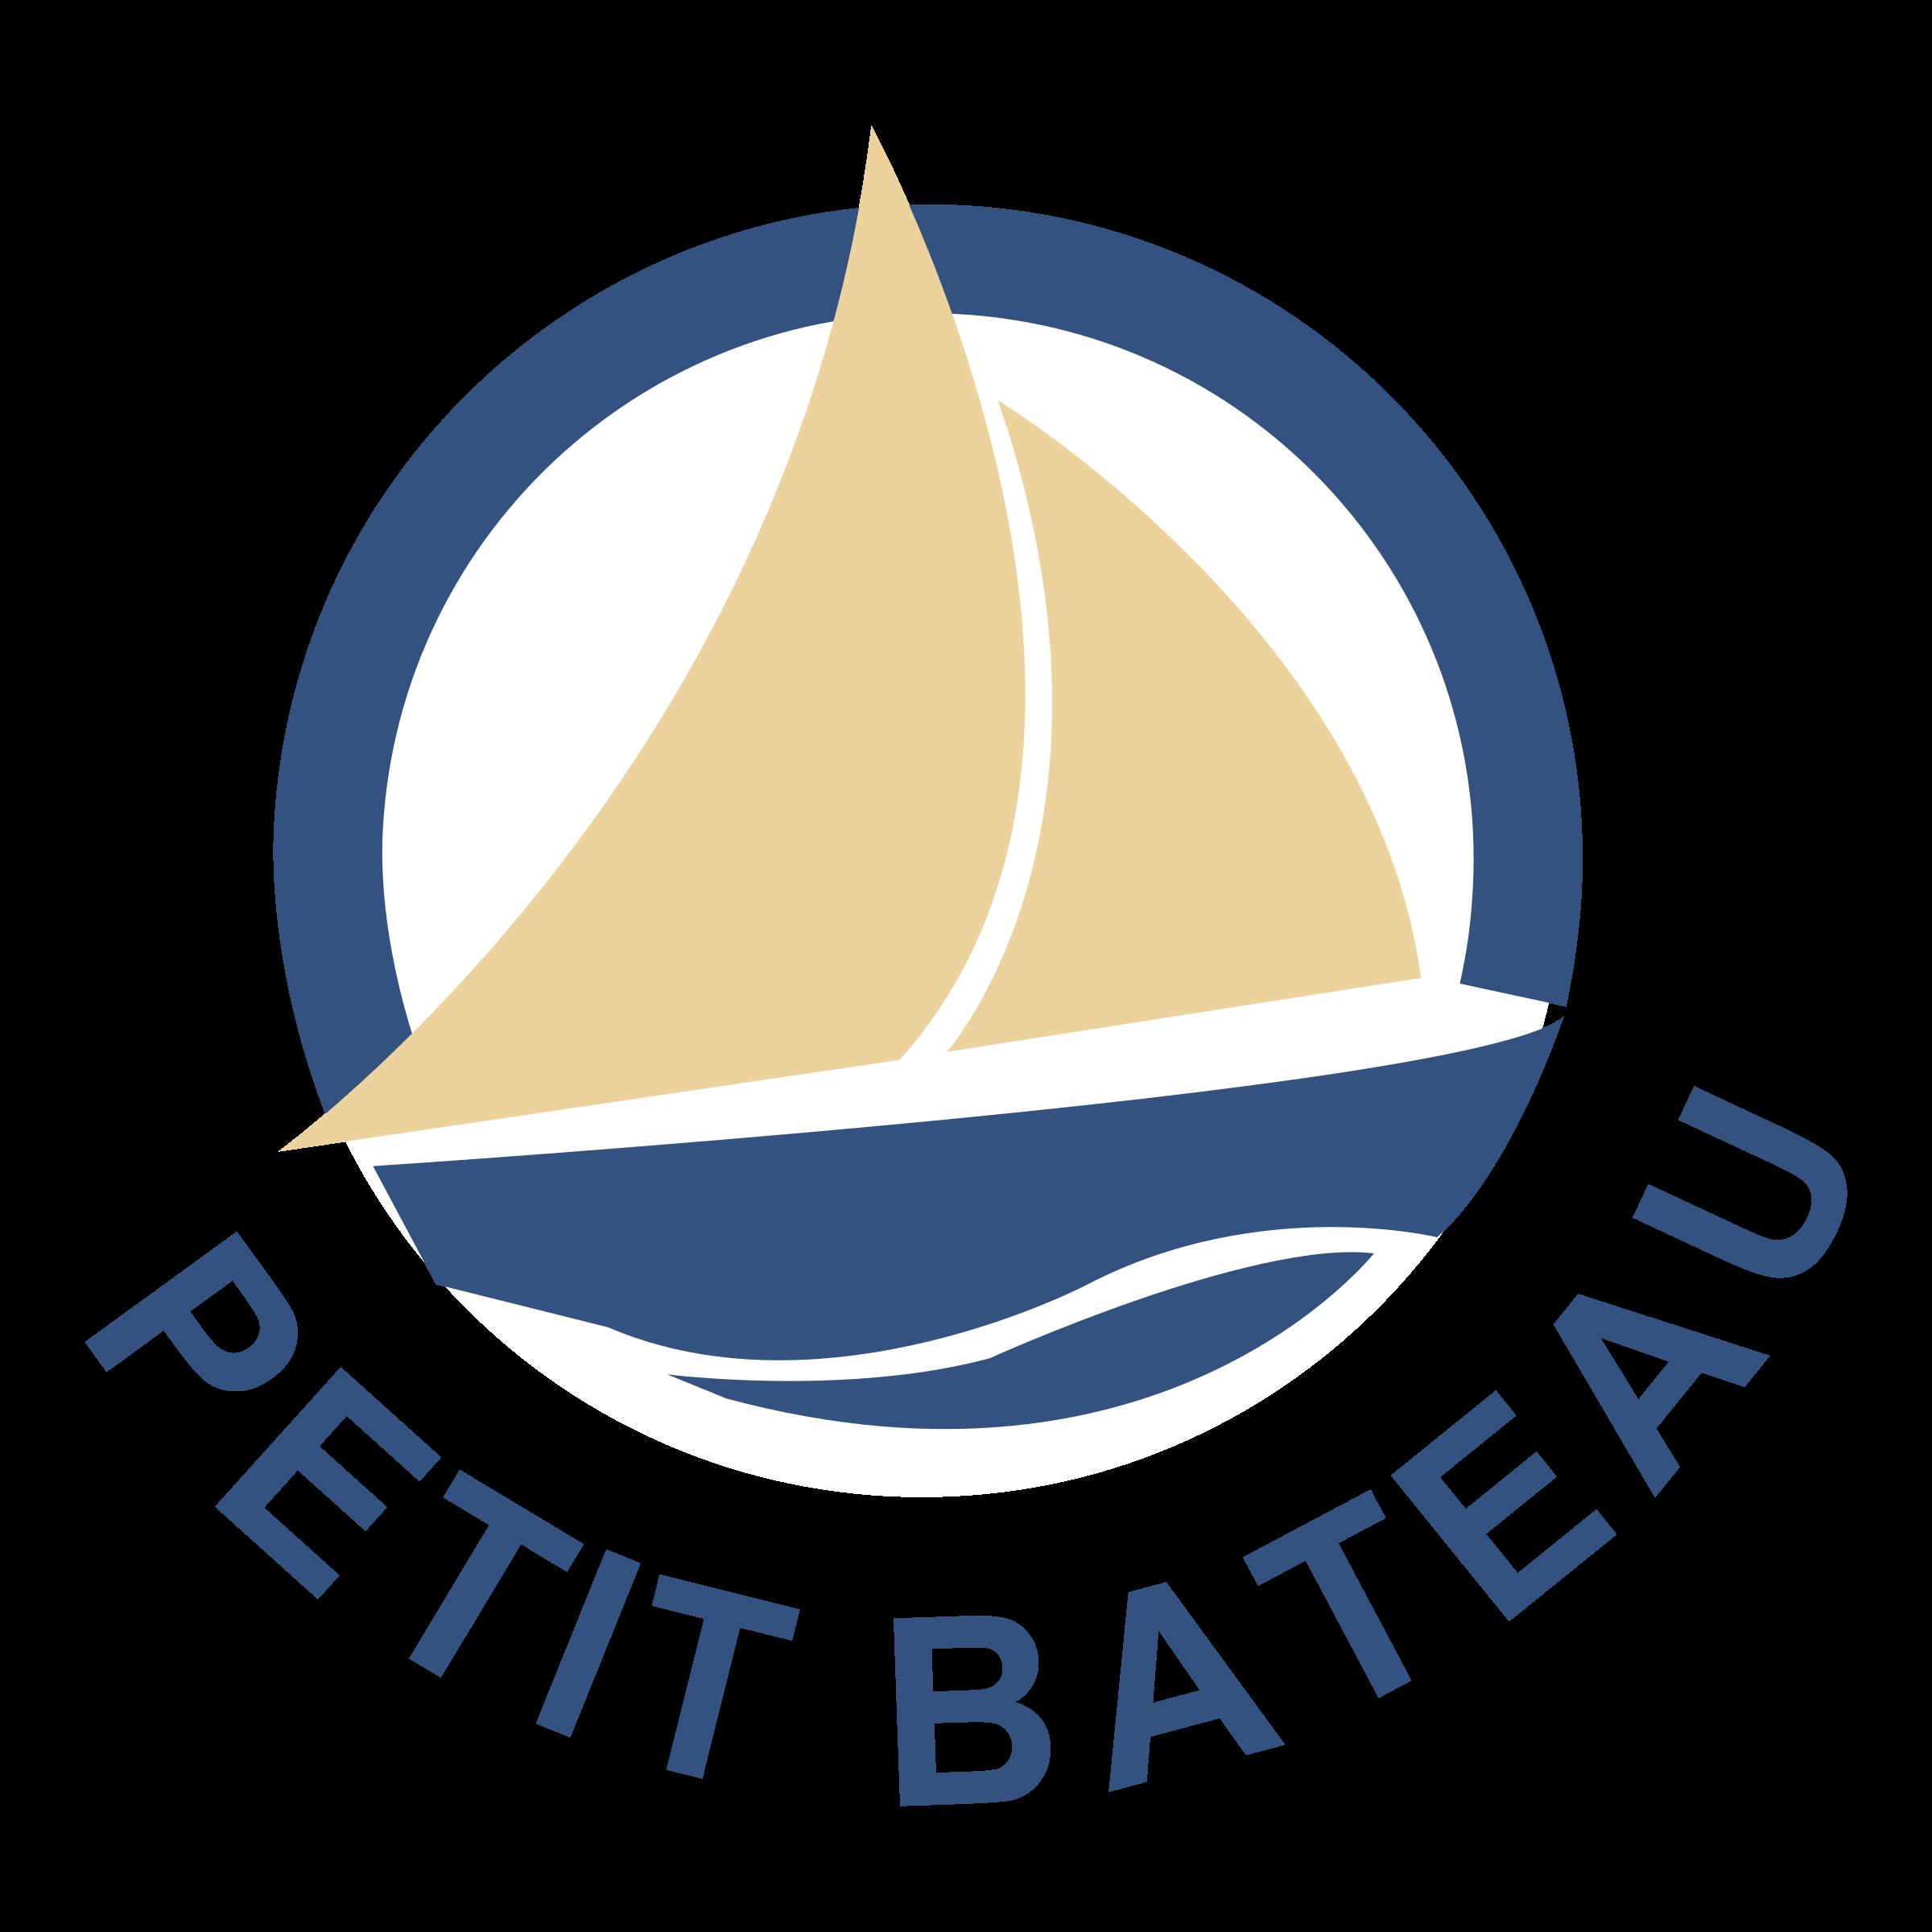 Petit Bateau Logo PNG Transparent & SVG Vector.